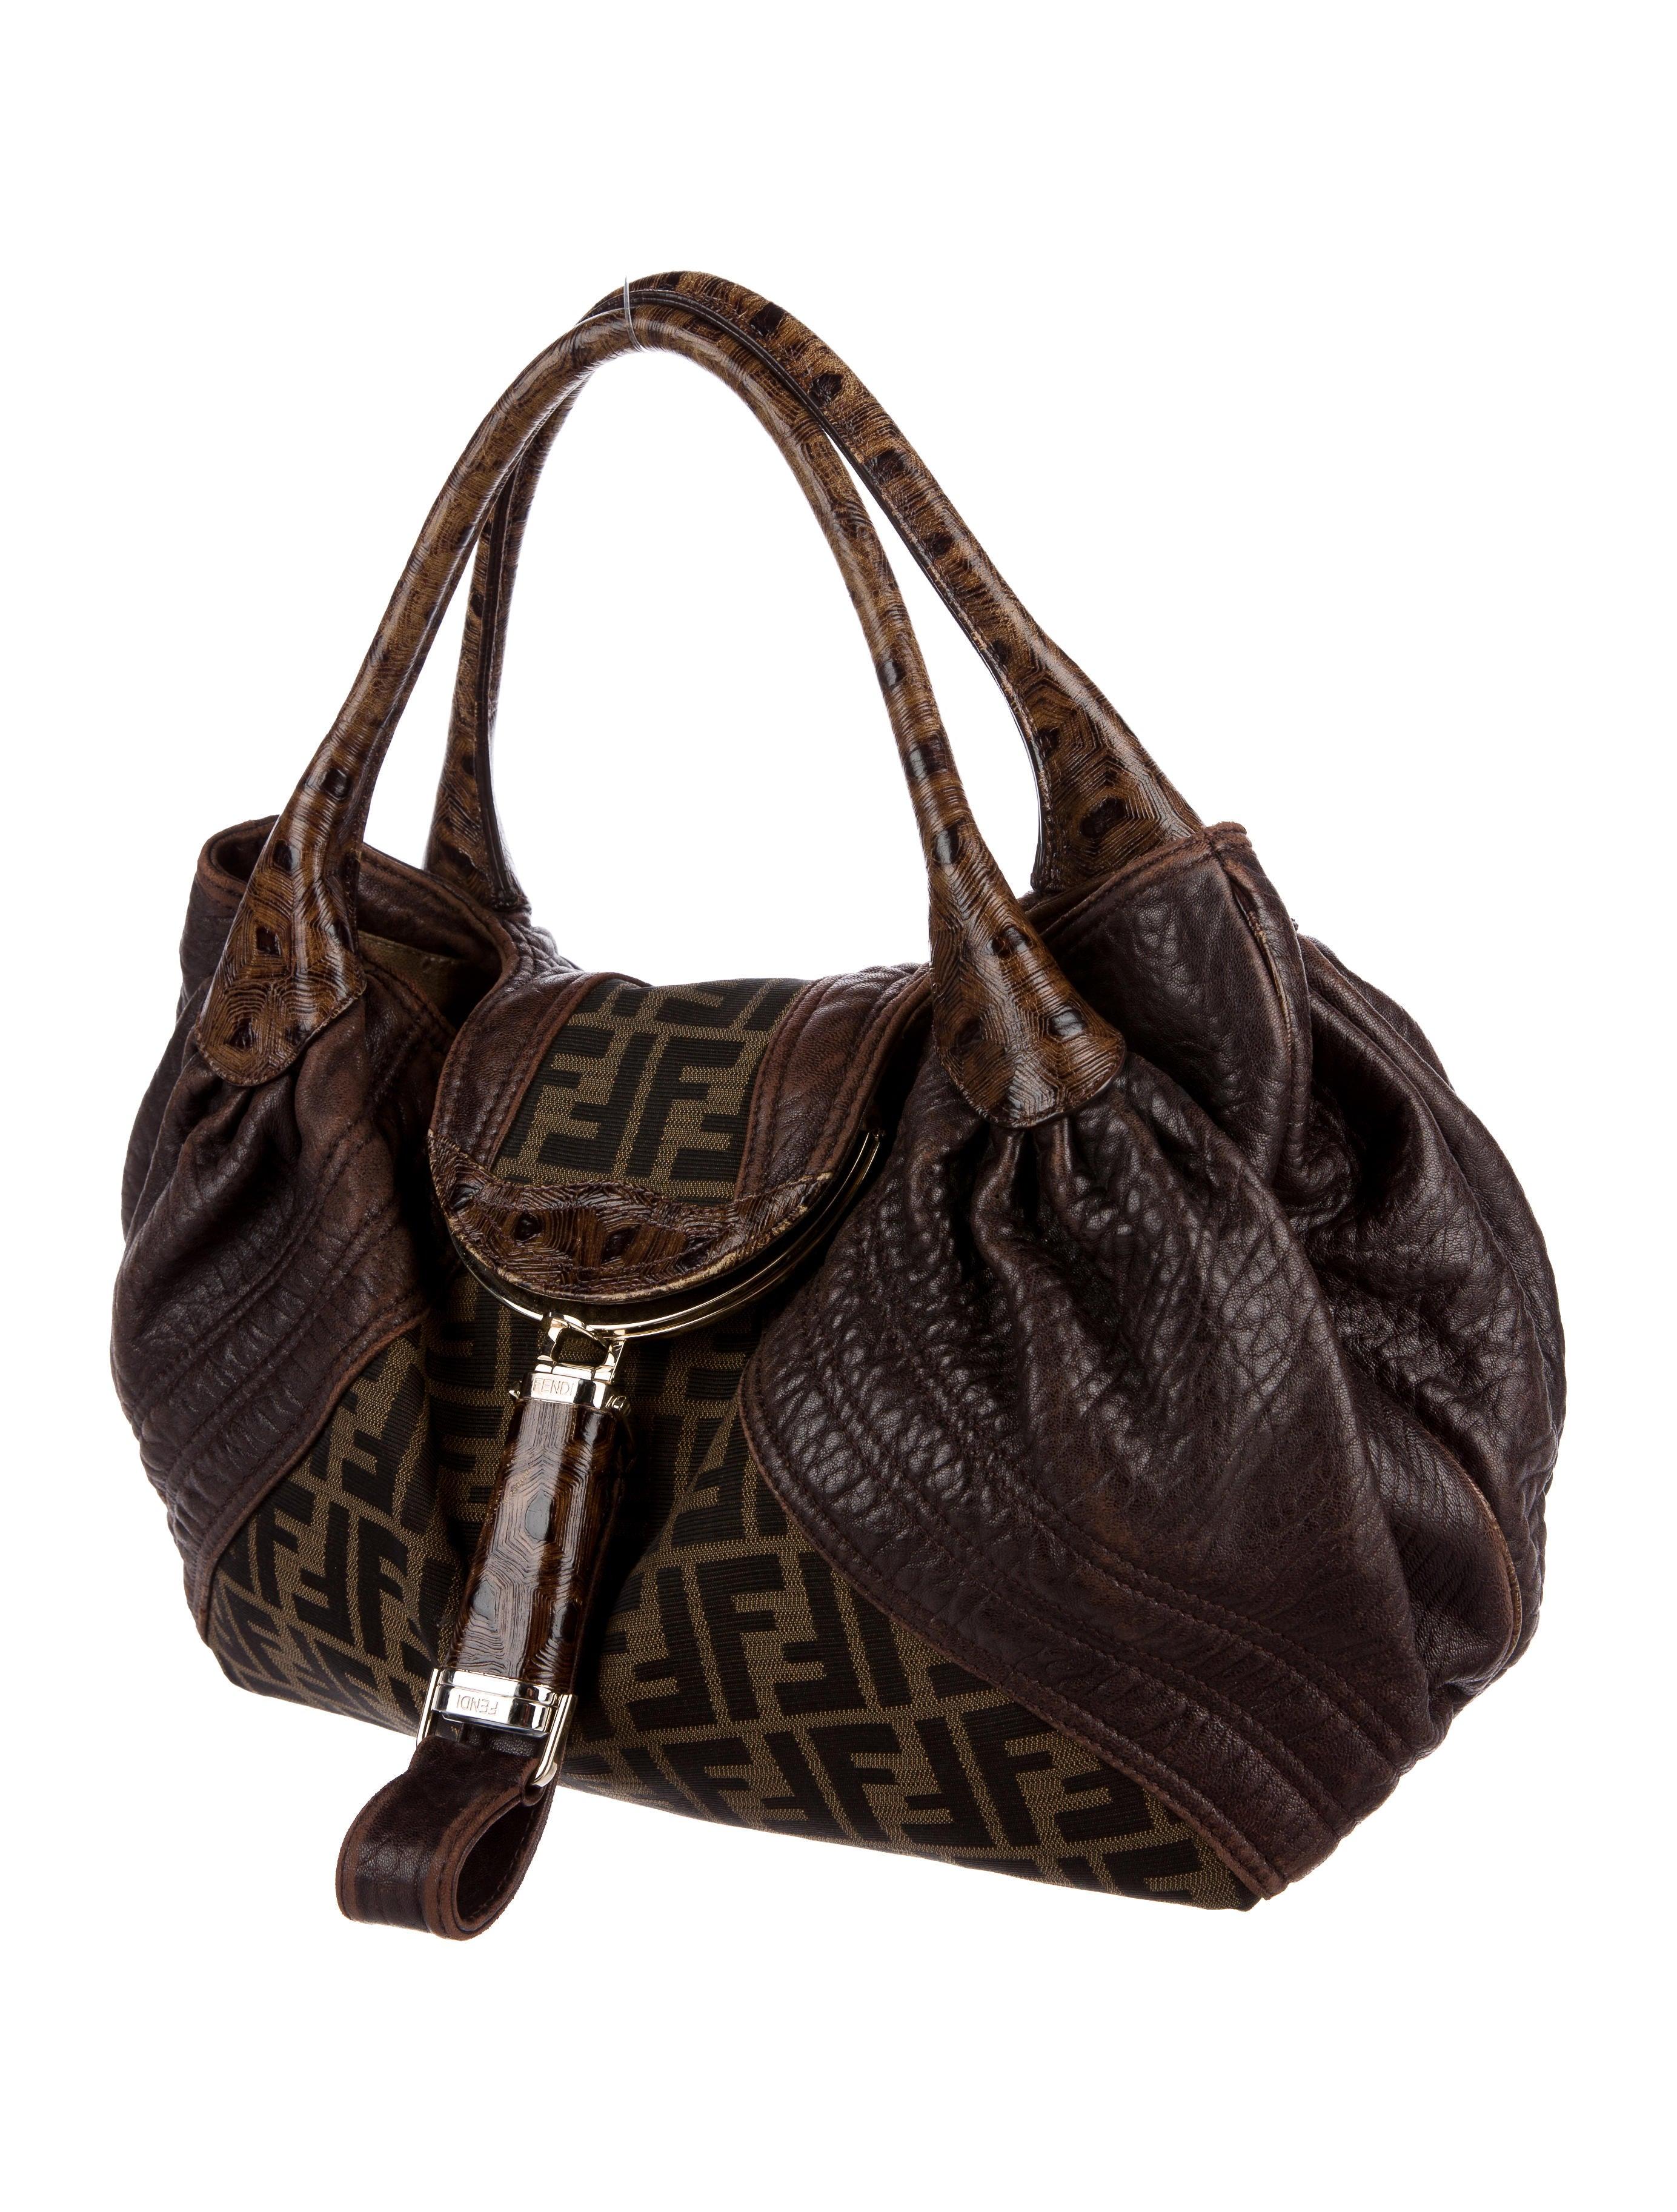 1ec2c3755883 ... switzerland fendi zucca spy bag handbags fen66991 the realreal 3a028  db531